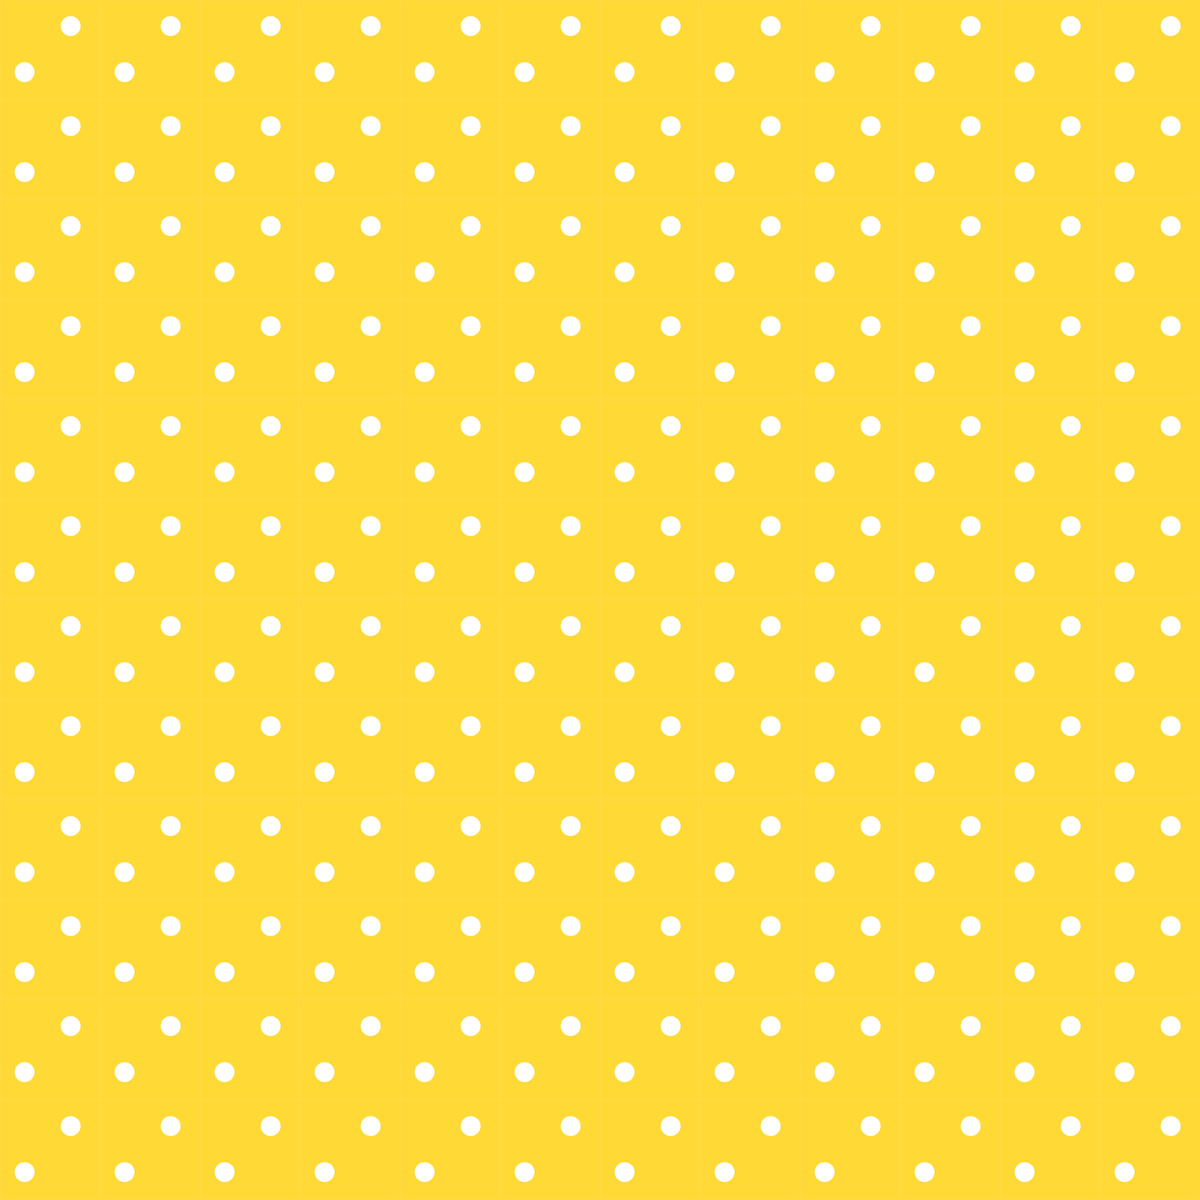 free polka dot scrapbook papers ausdruckbares geschenkpapier freebie printable polka dot. Black Bedroom Furniture Sets. Home Design Ideas